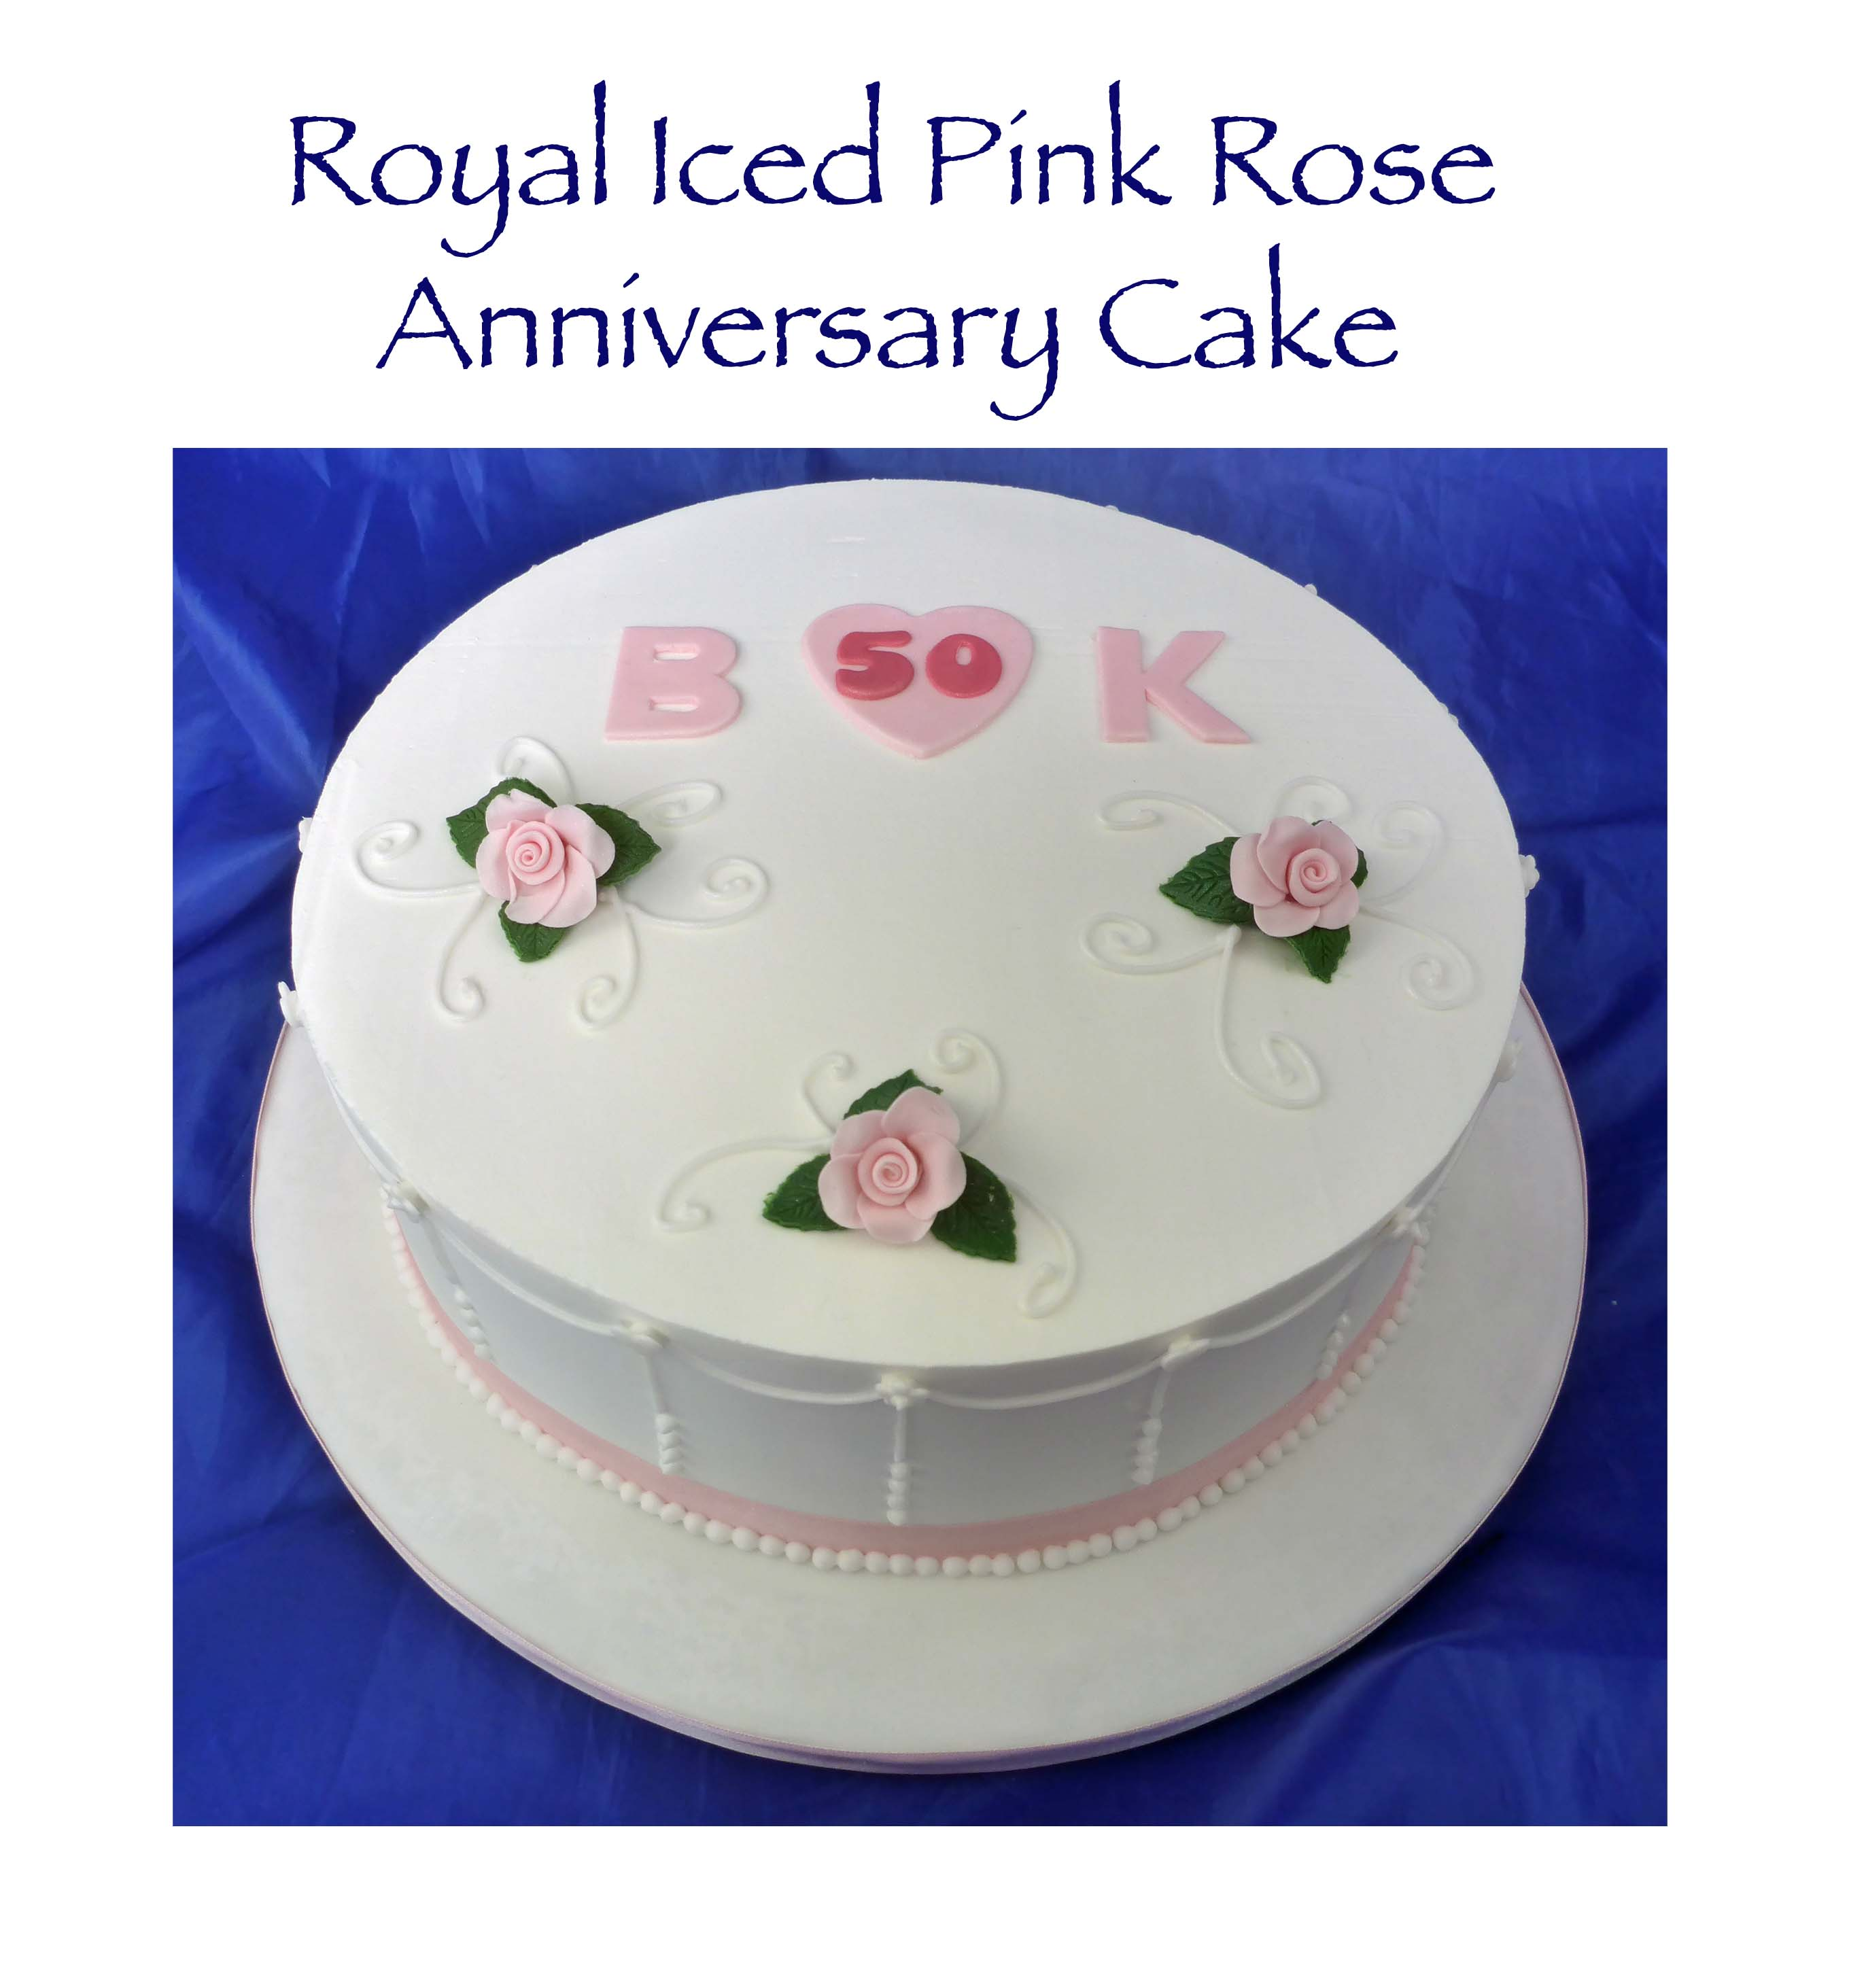 Royal Iced Pink Rose Anniversary Cake